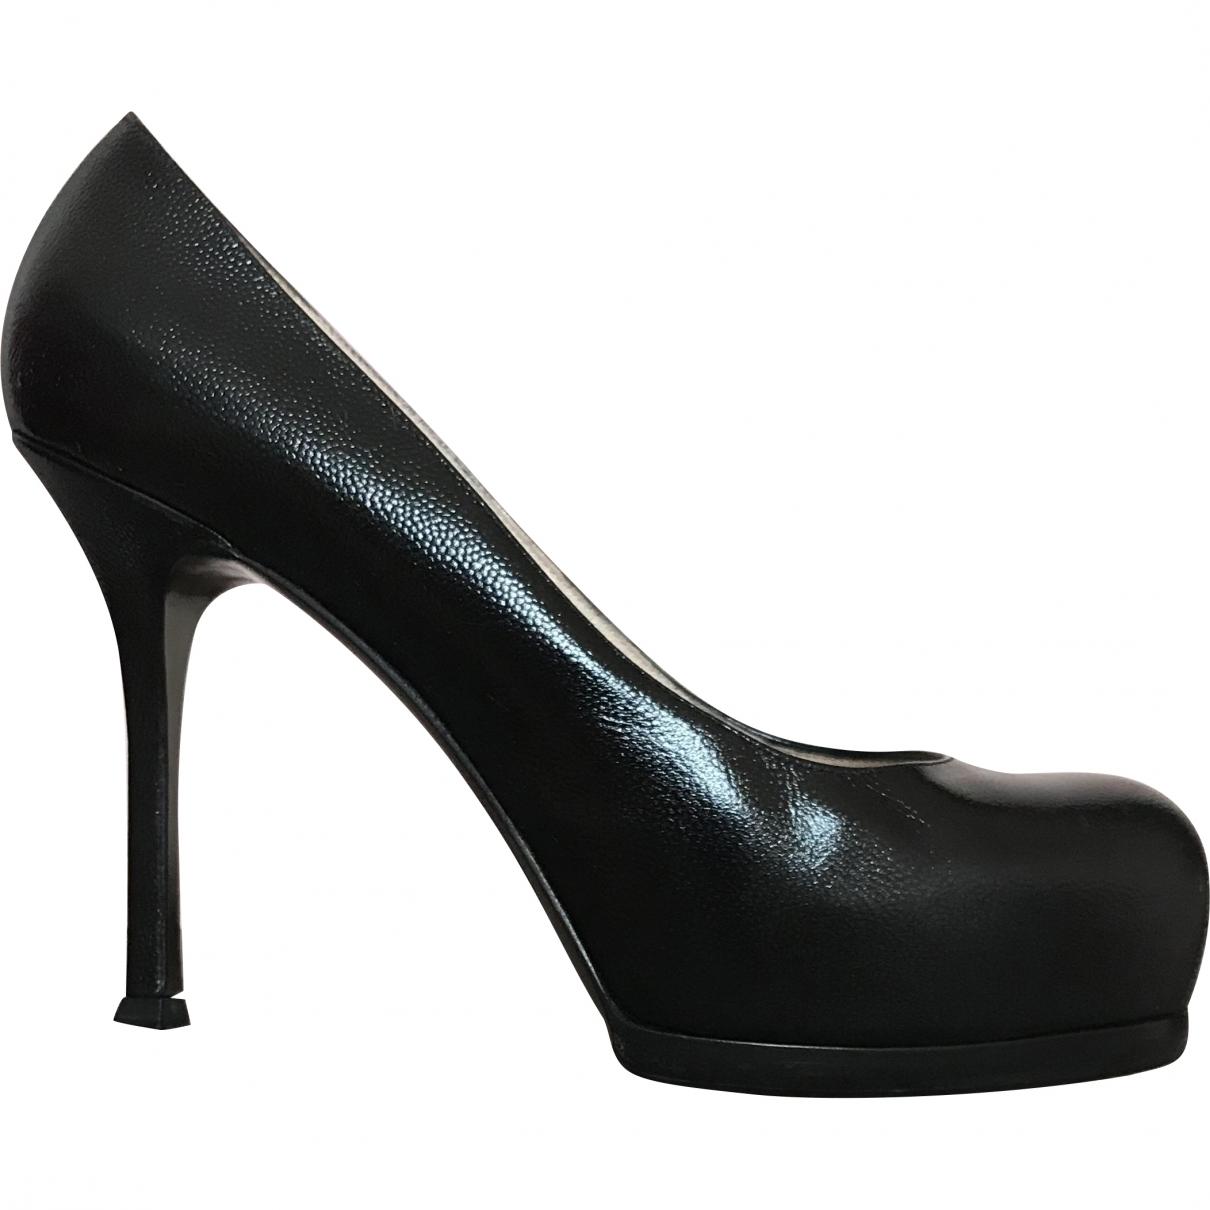 Yves Saint Laurent Trib Too Black Leather Heels for Women 39 EU